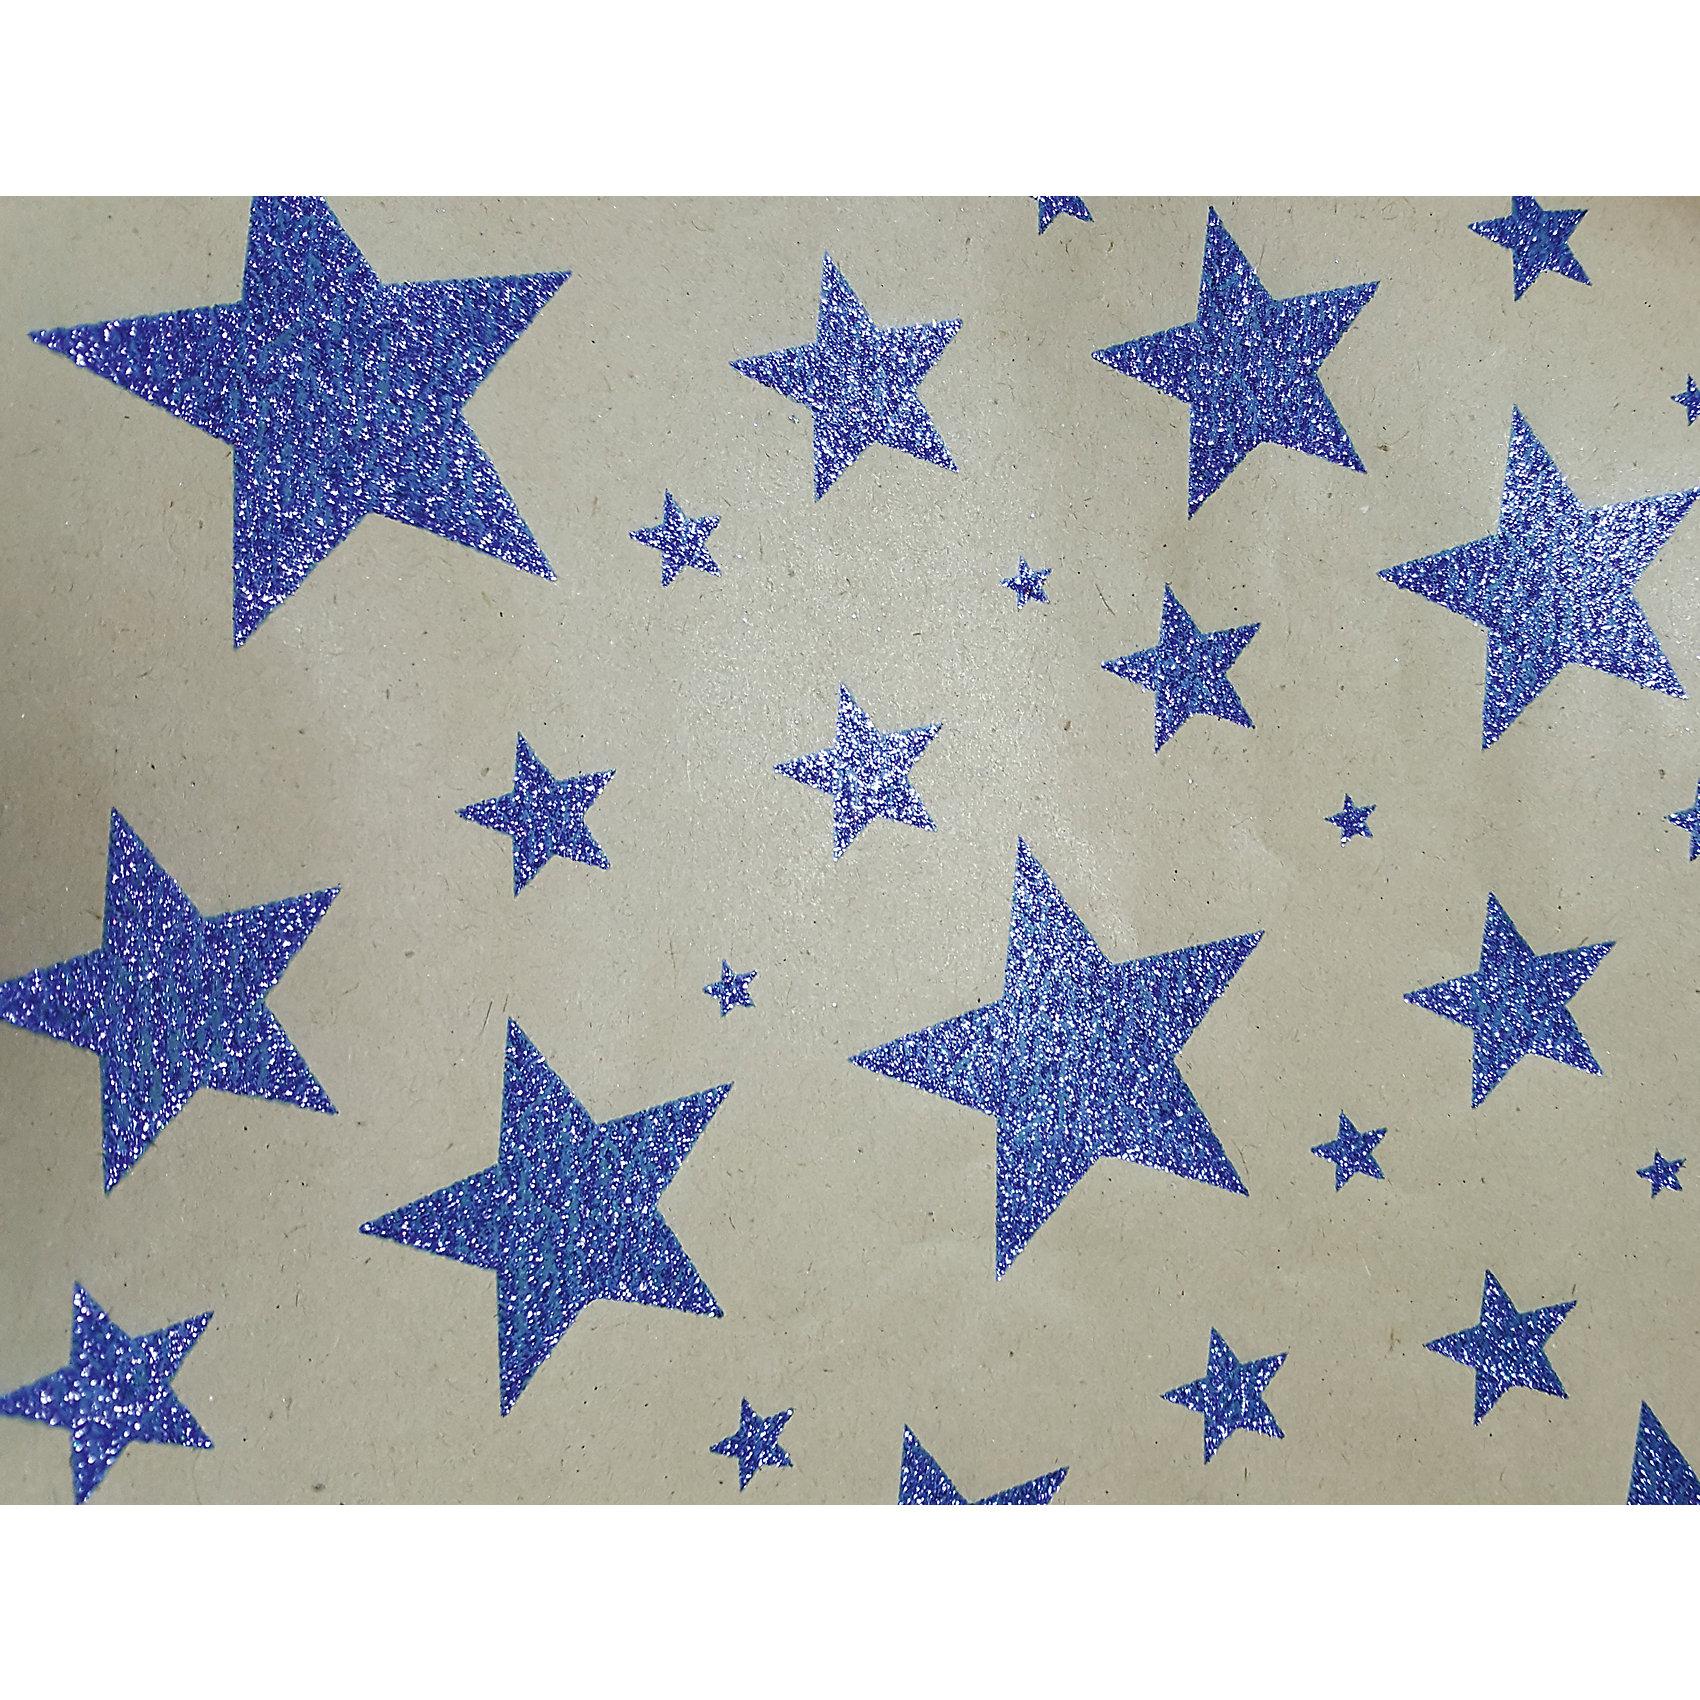 Крафт бумага Синие звезды для сувенирной продукции в листах от myToys